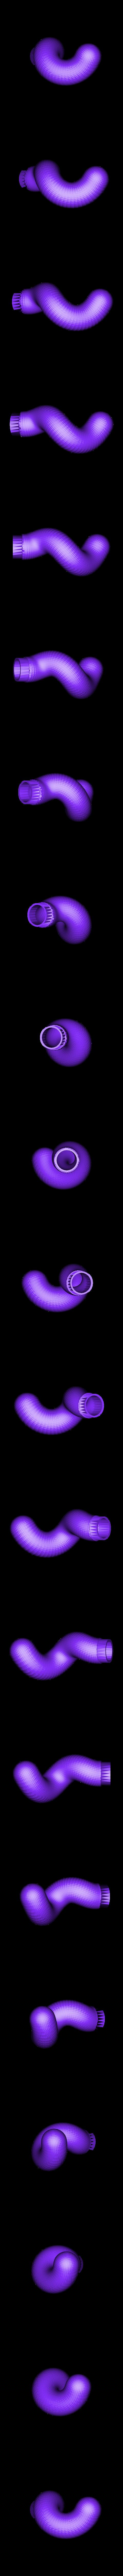 LampPartC.stl Download free STL file Amoeba LED Lamp-V1 • 3D printing template, ChrisBobo